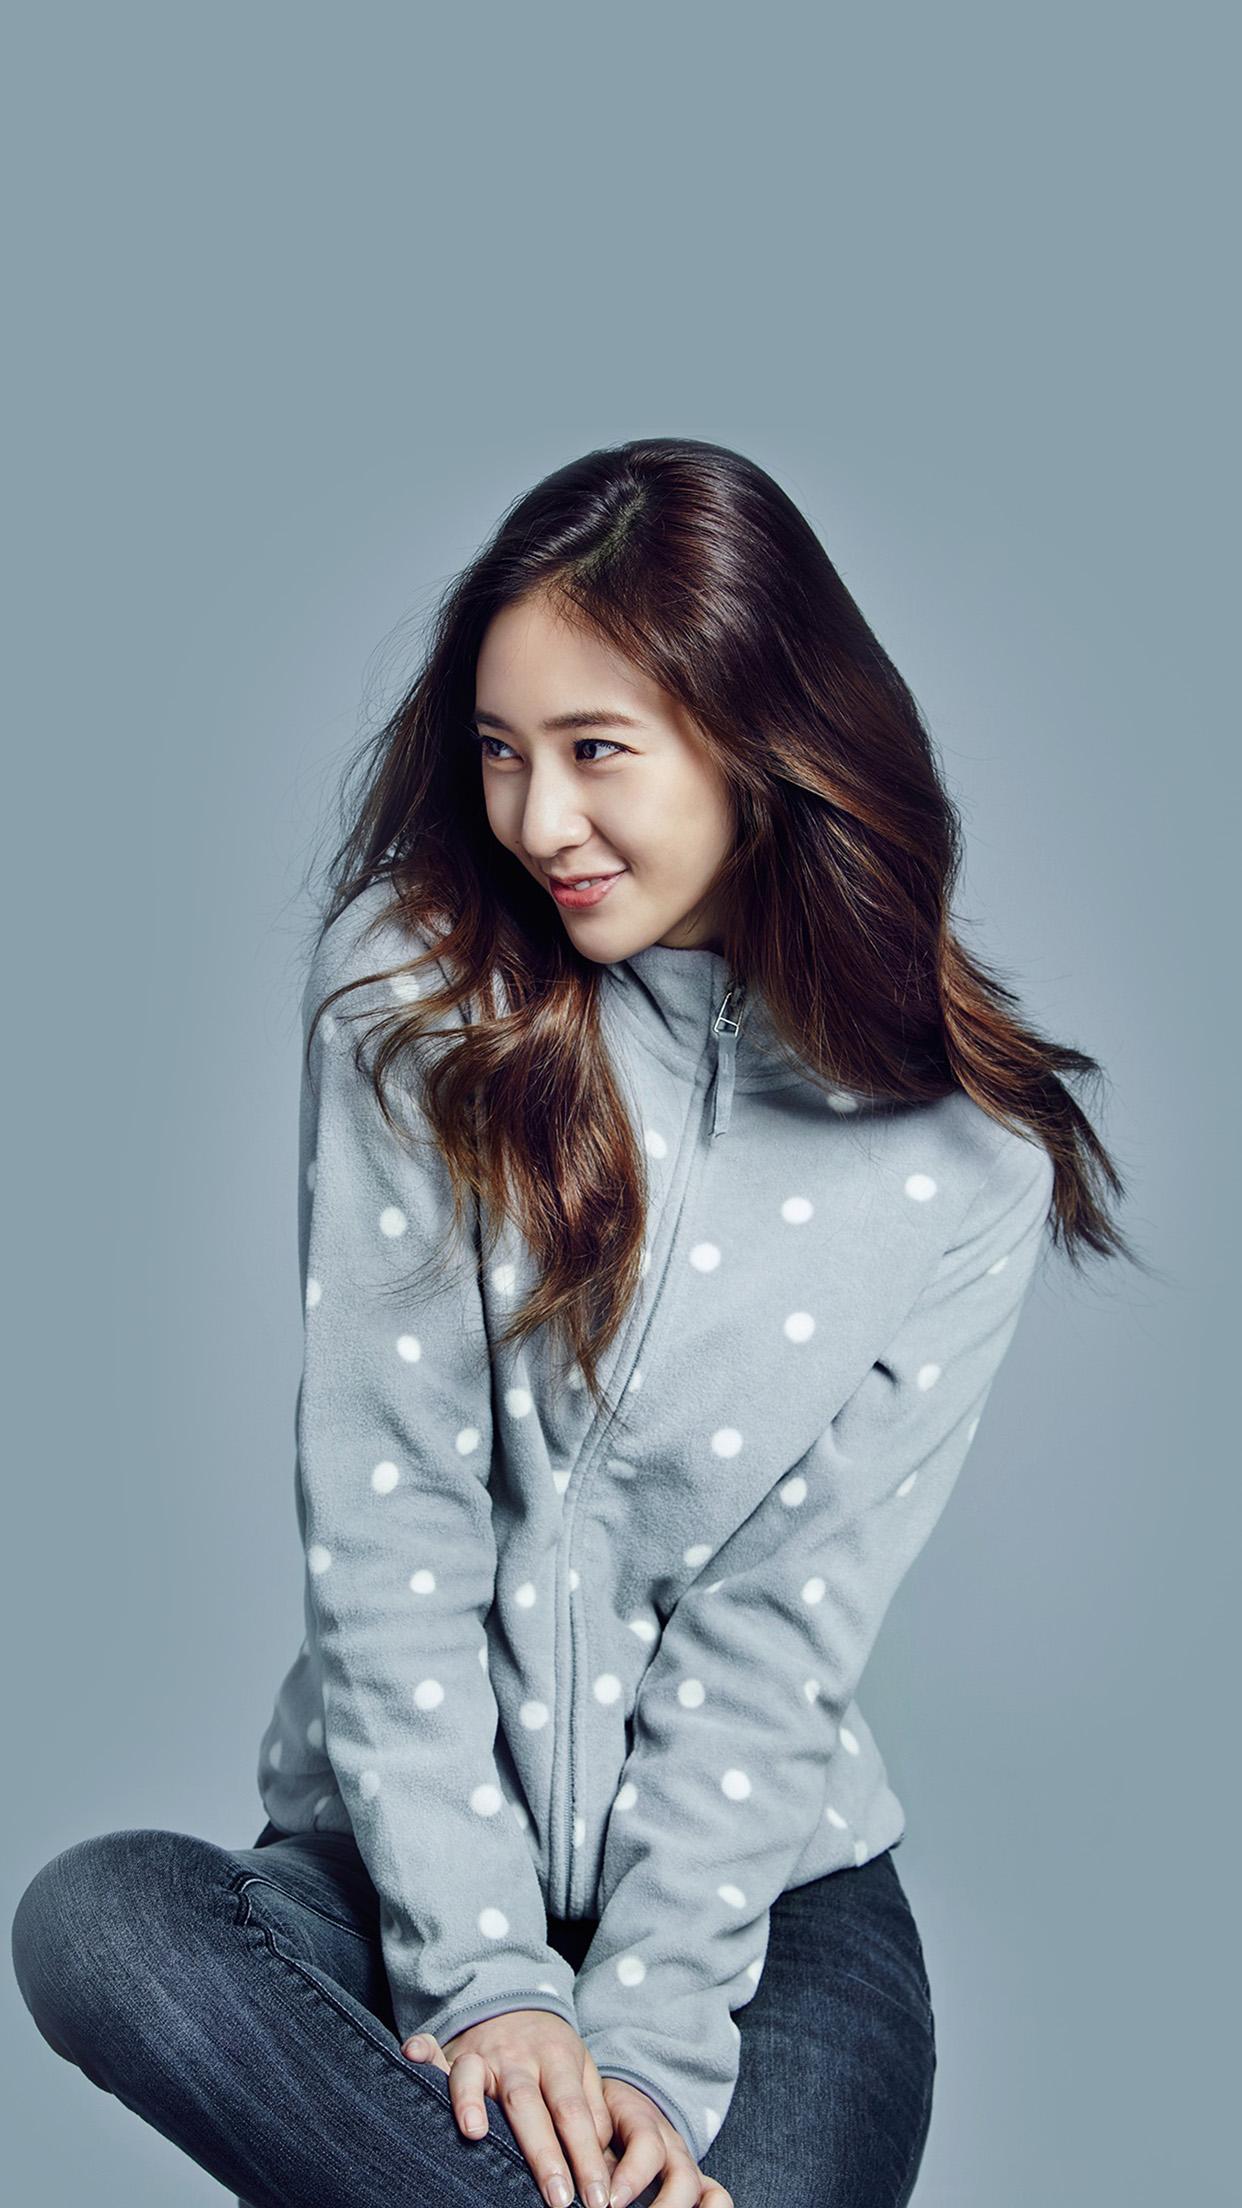 Hl01 Crystal Kpop Girl Fx Blue Wallpaper